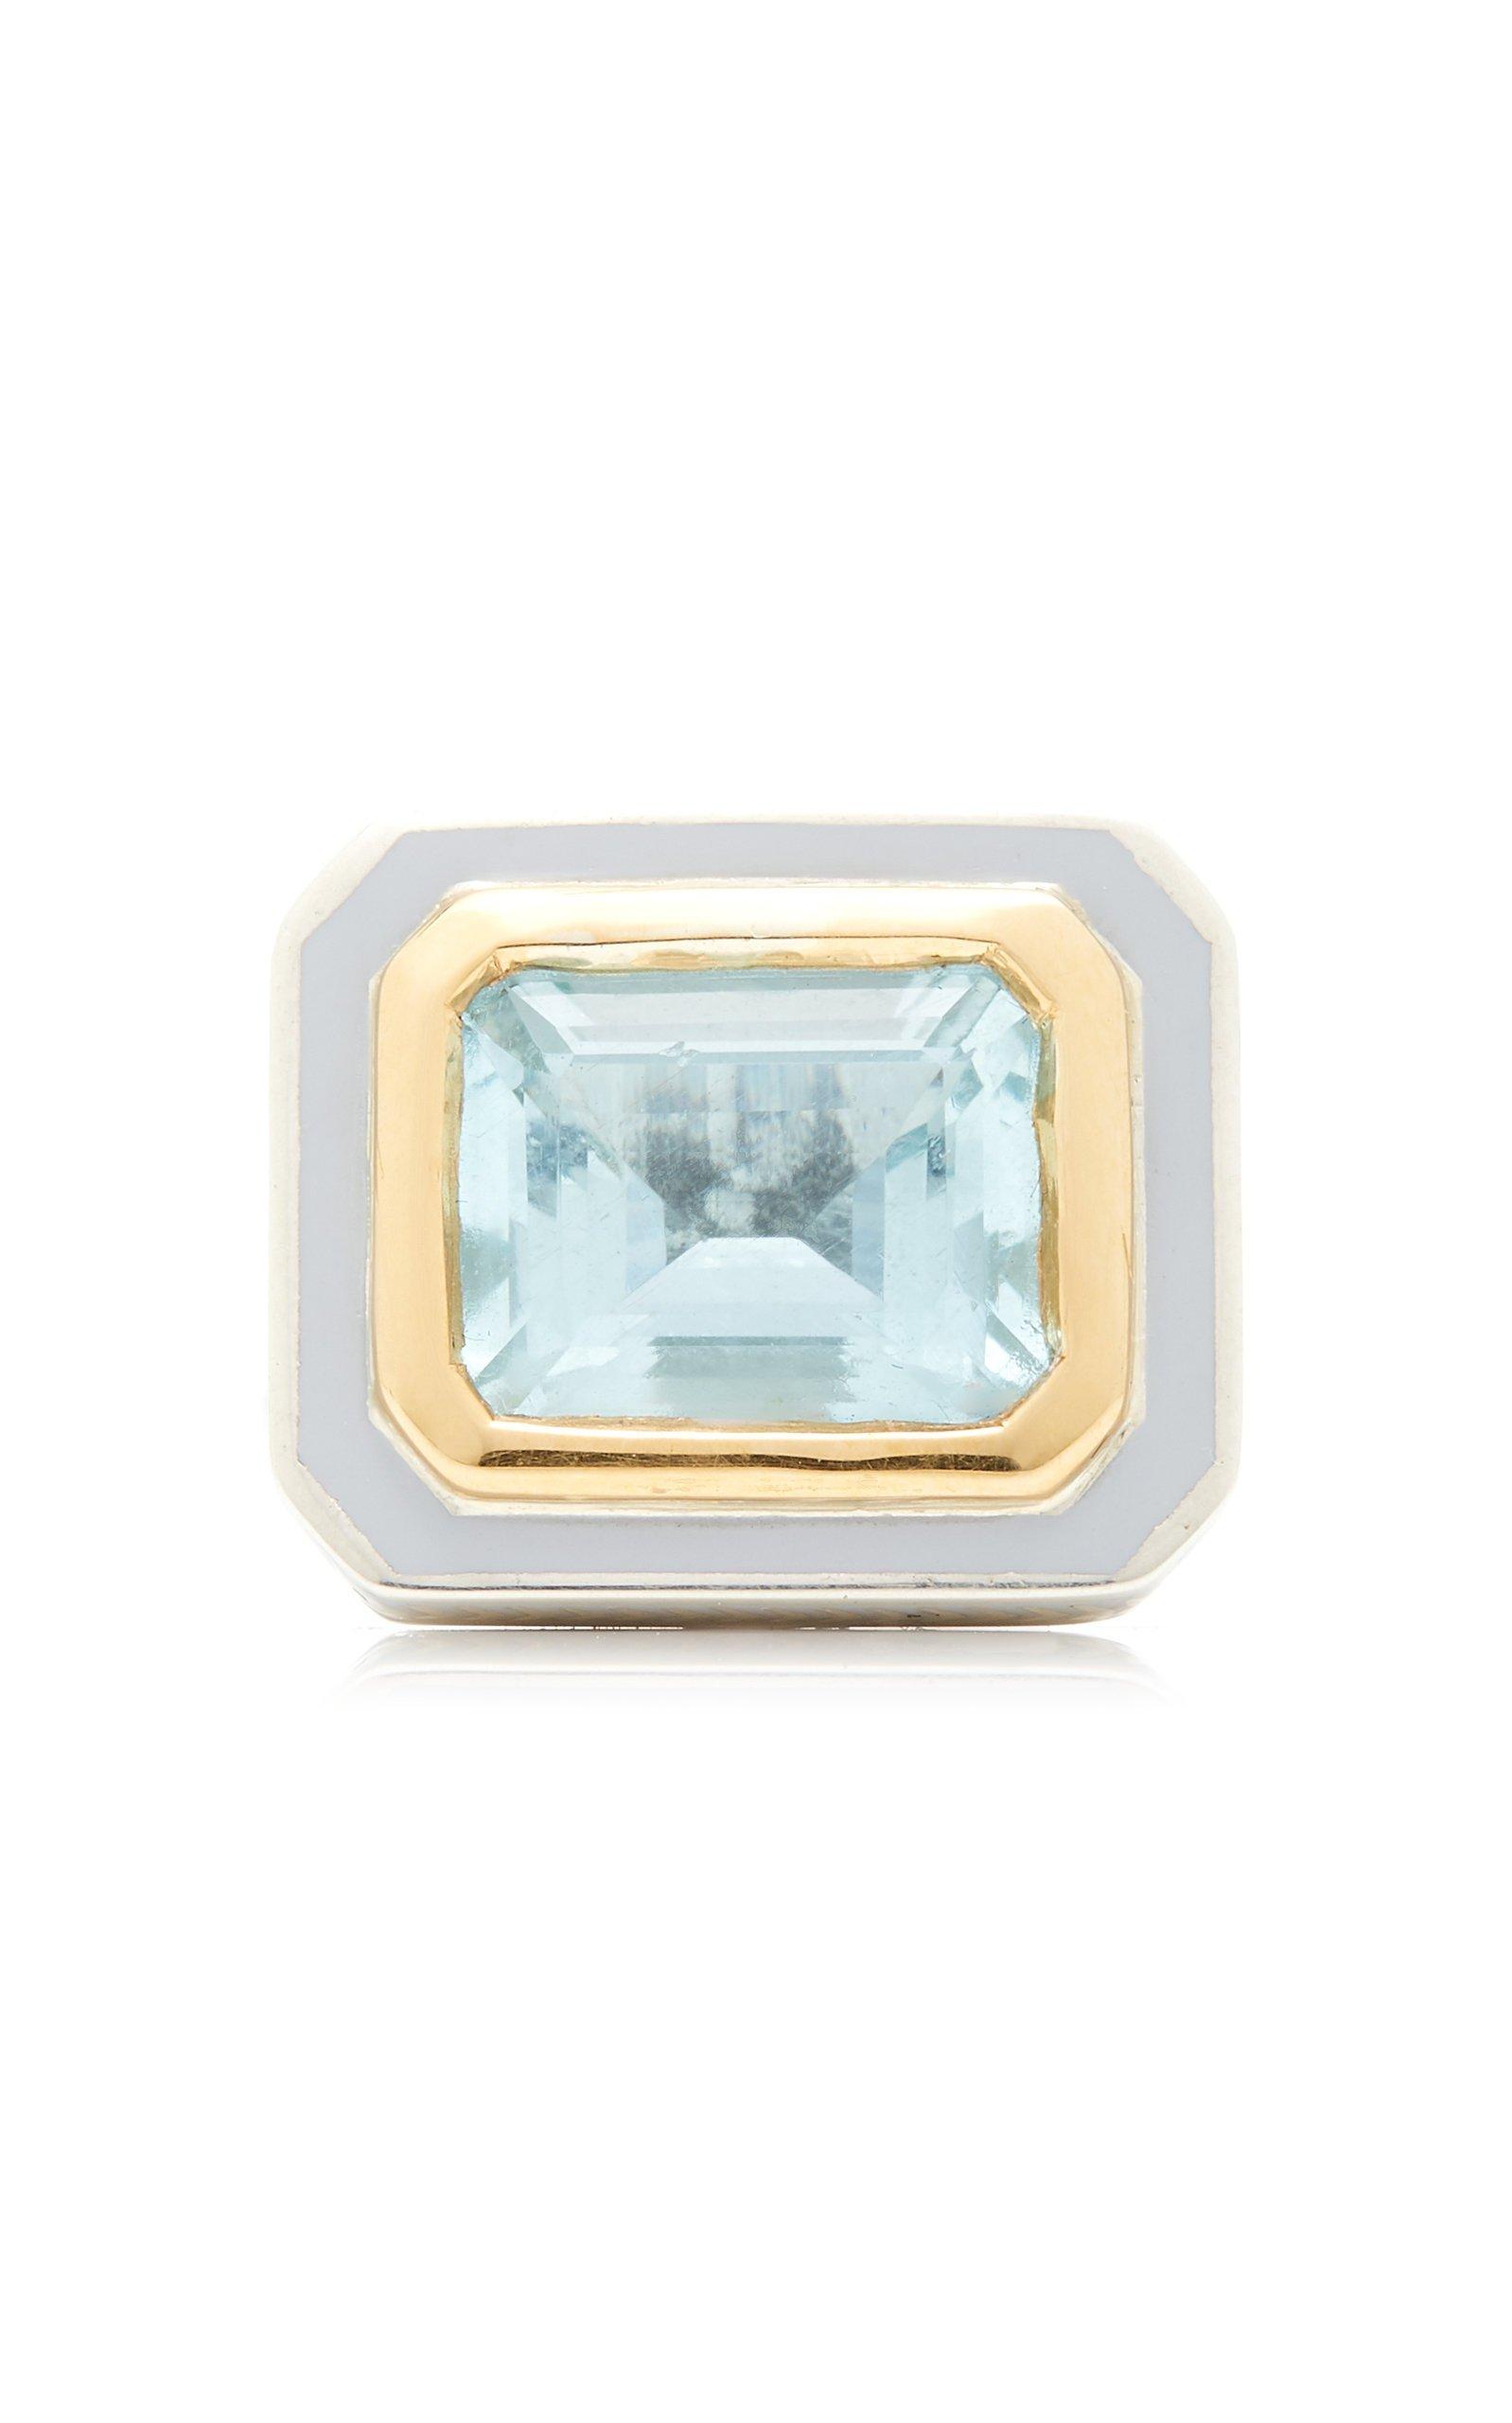 Alice Cicolini 22K Gold Sterling Silver And Aquamarine Ring